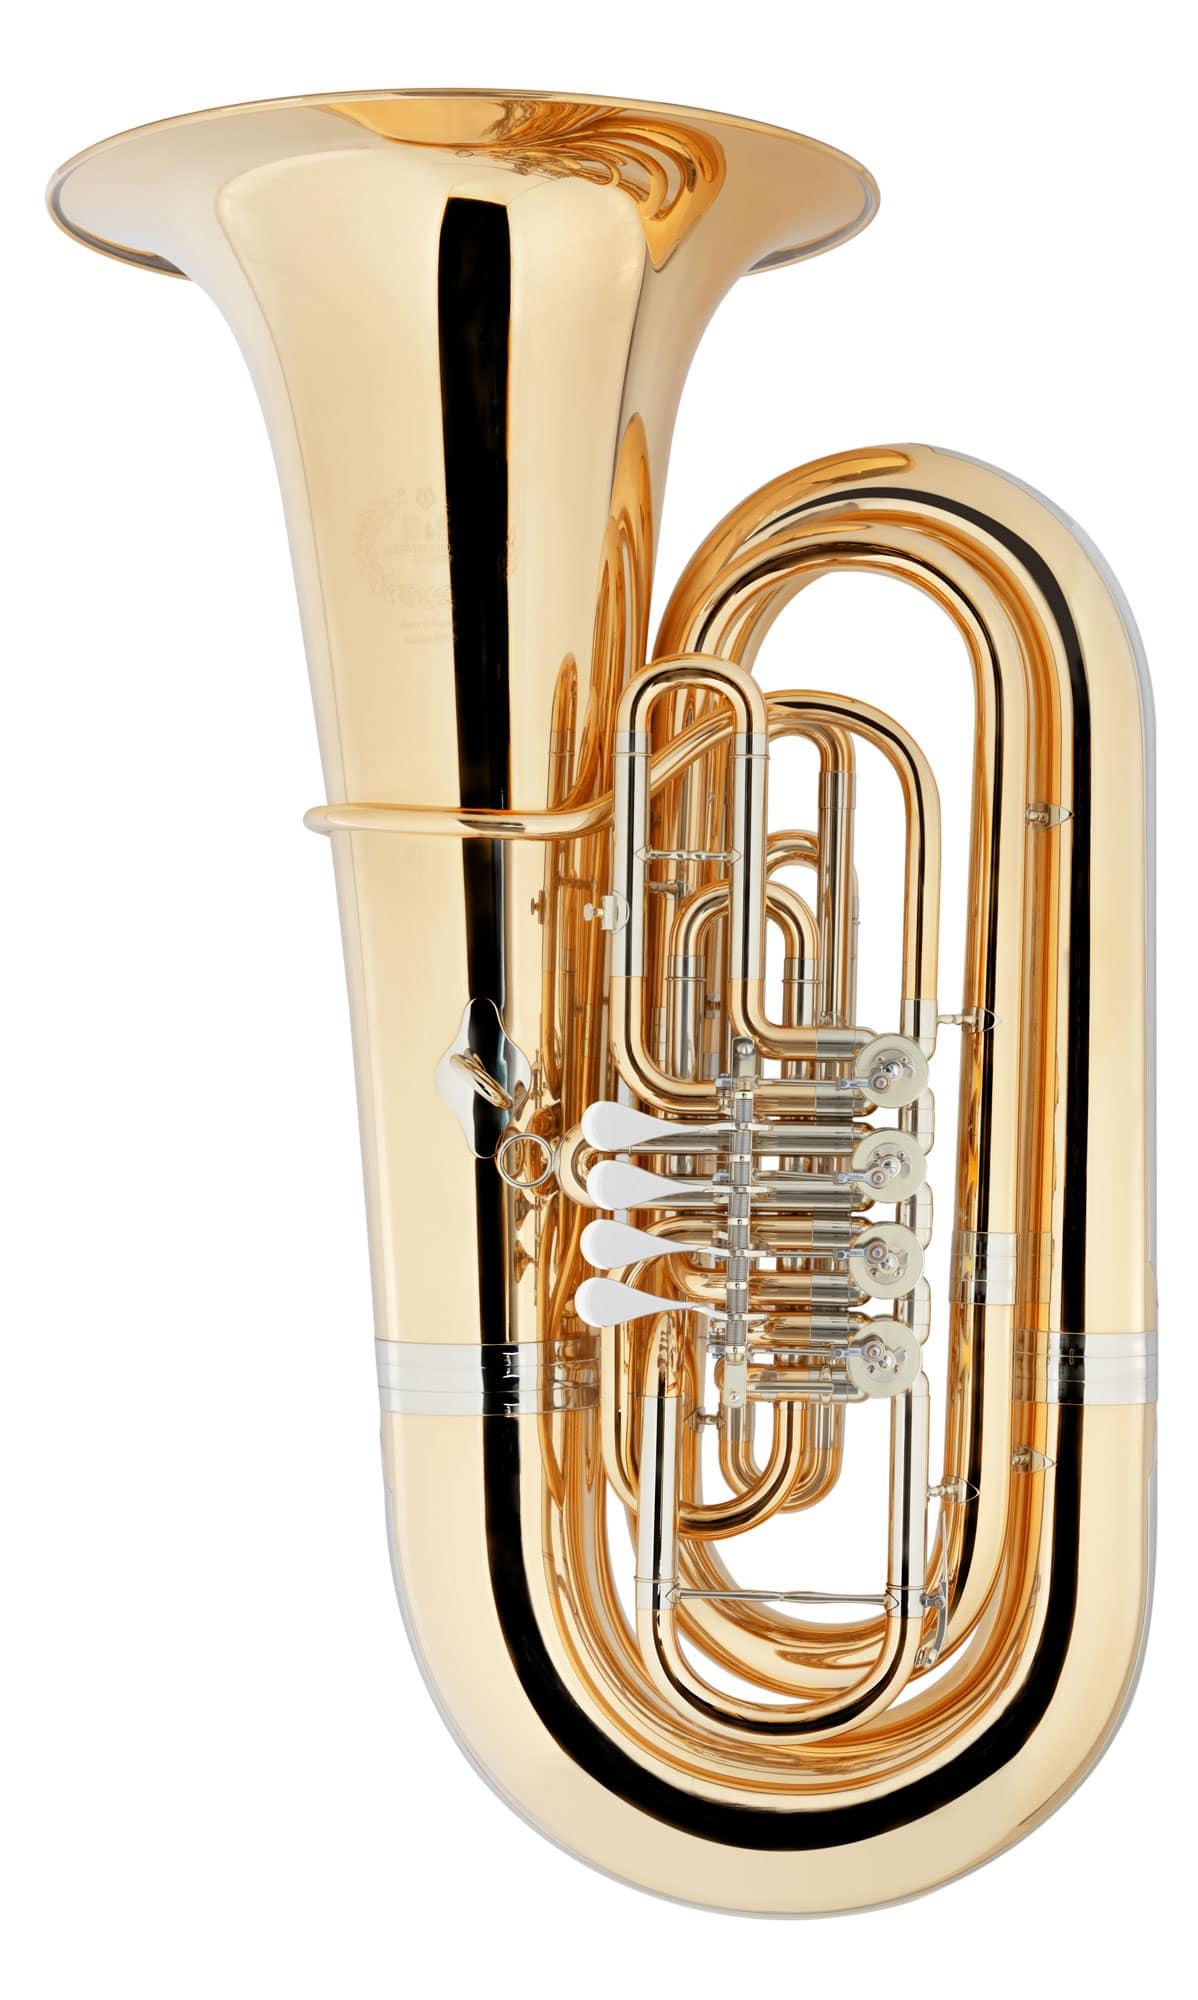 new product a5a02 802c9 B&S GR55 5/4 Bb Tuba Goldmessing klarlackiert